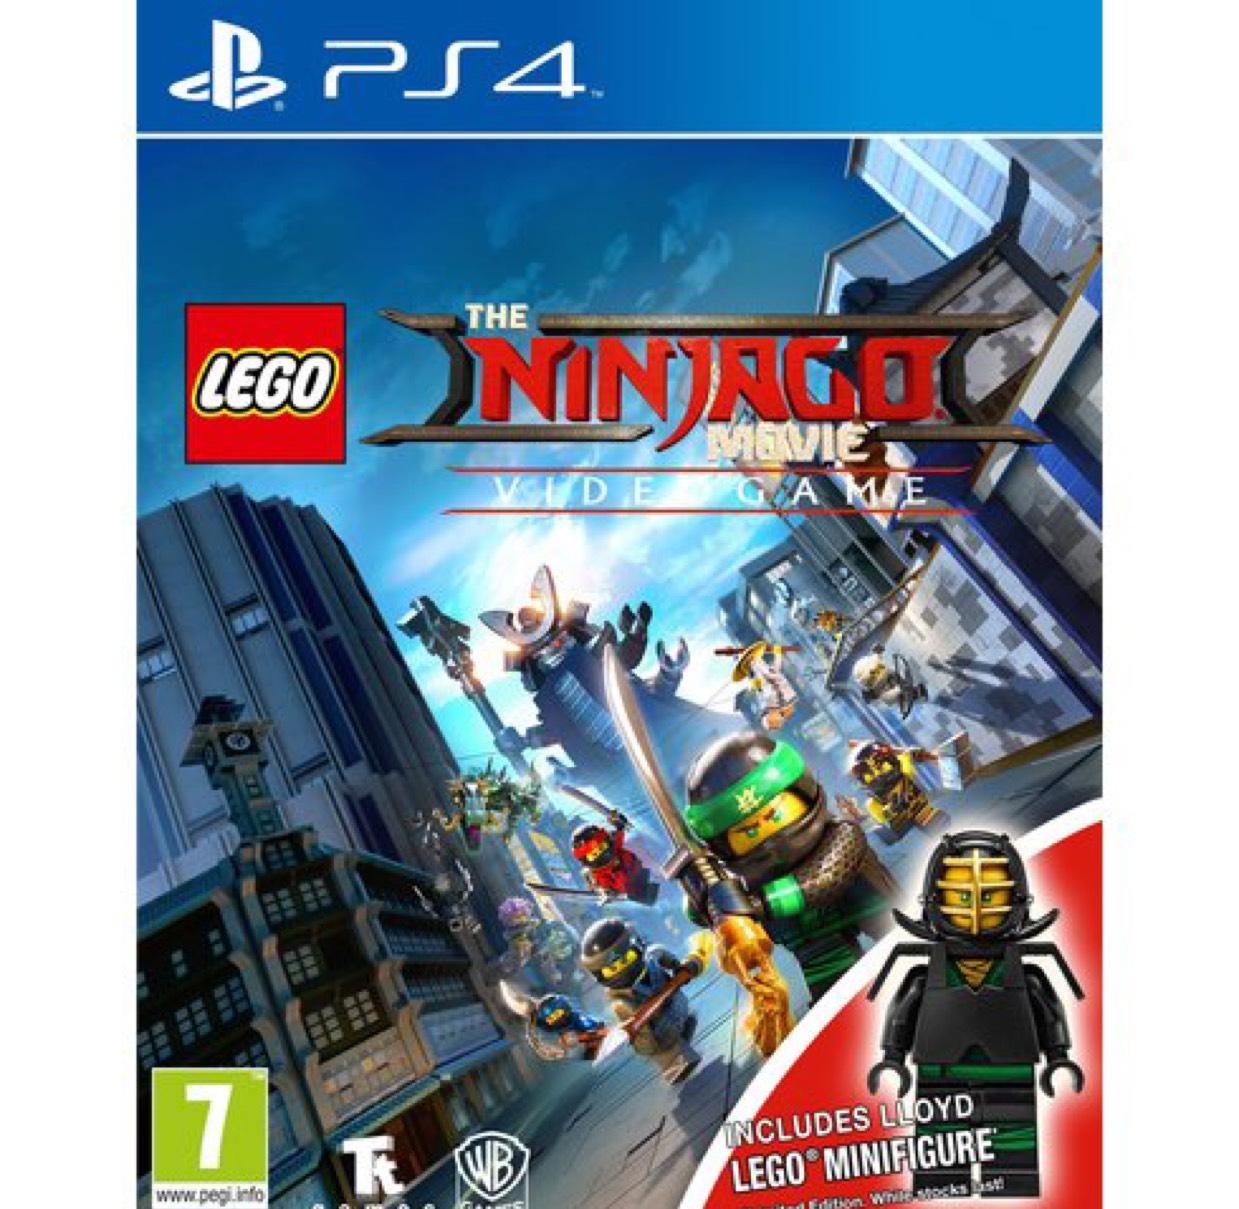 Lego Ninjago PS4/XBOX ONE - £24.99 @ Smyths Free Minifigure